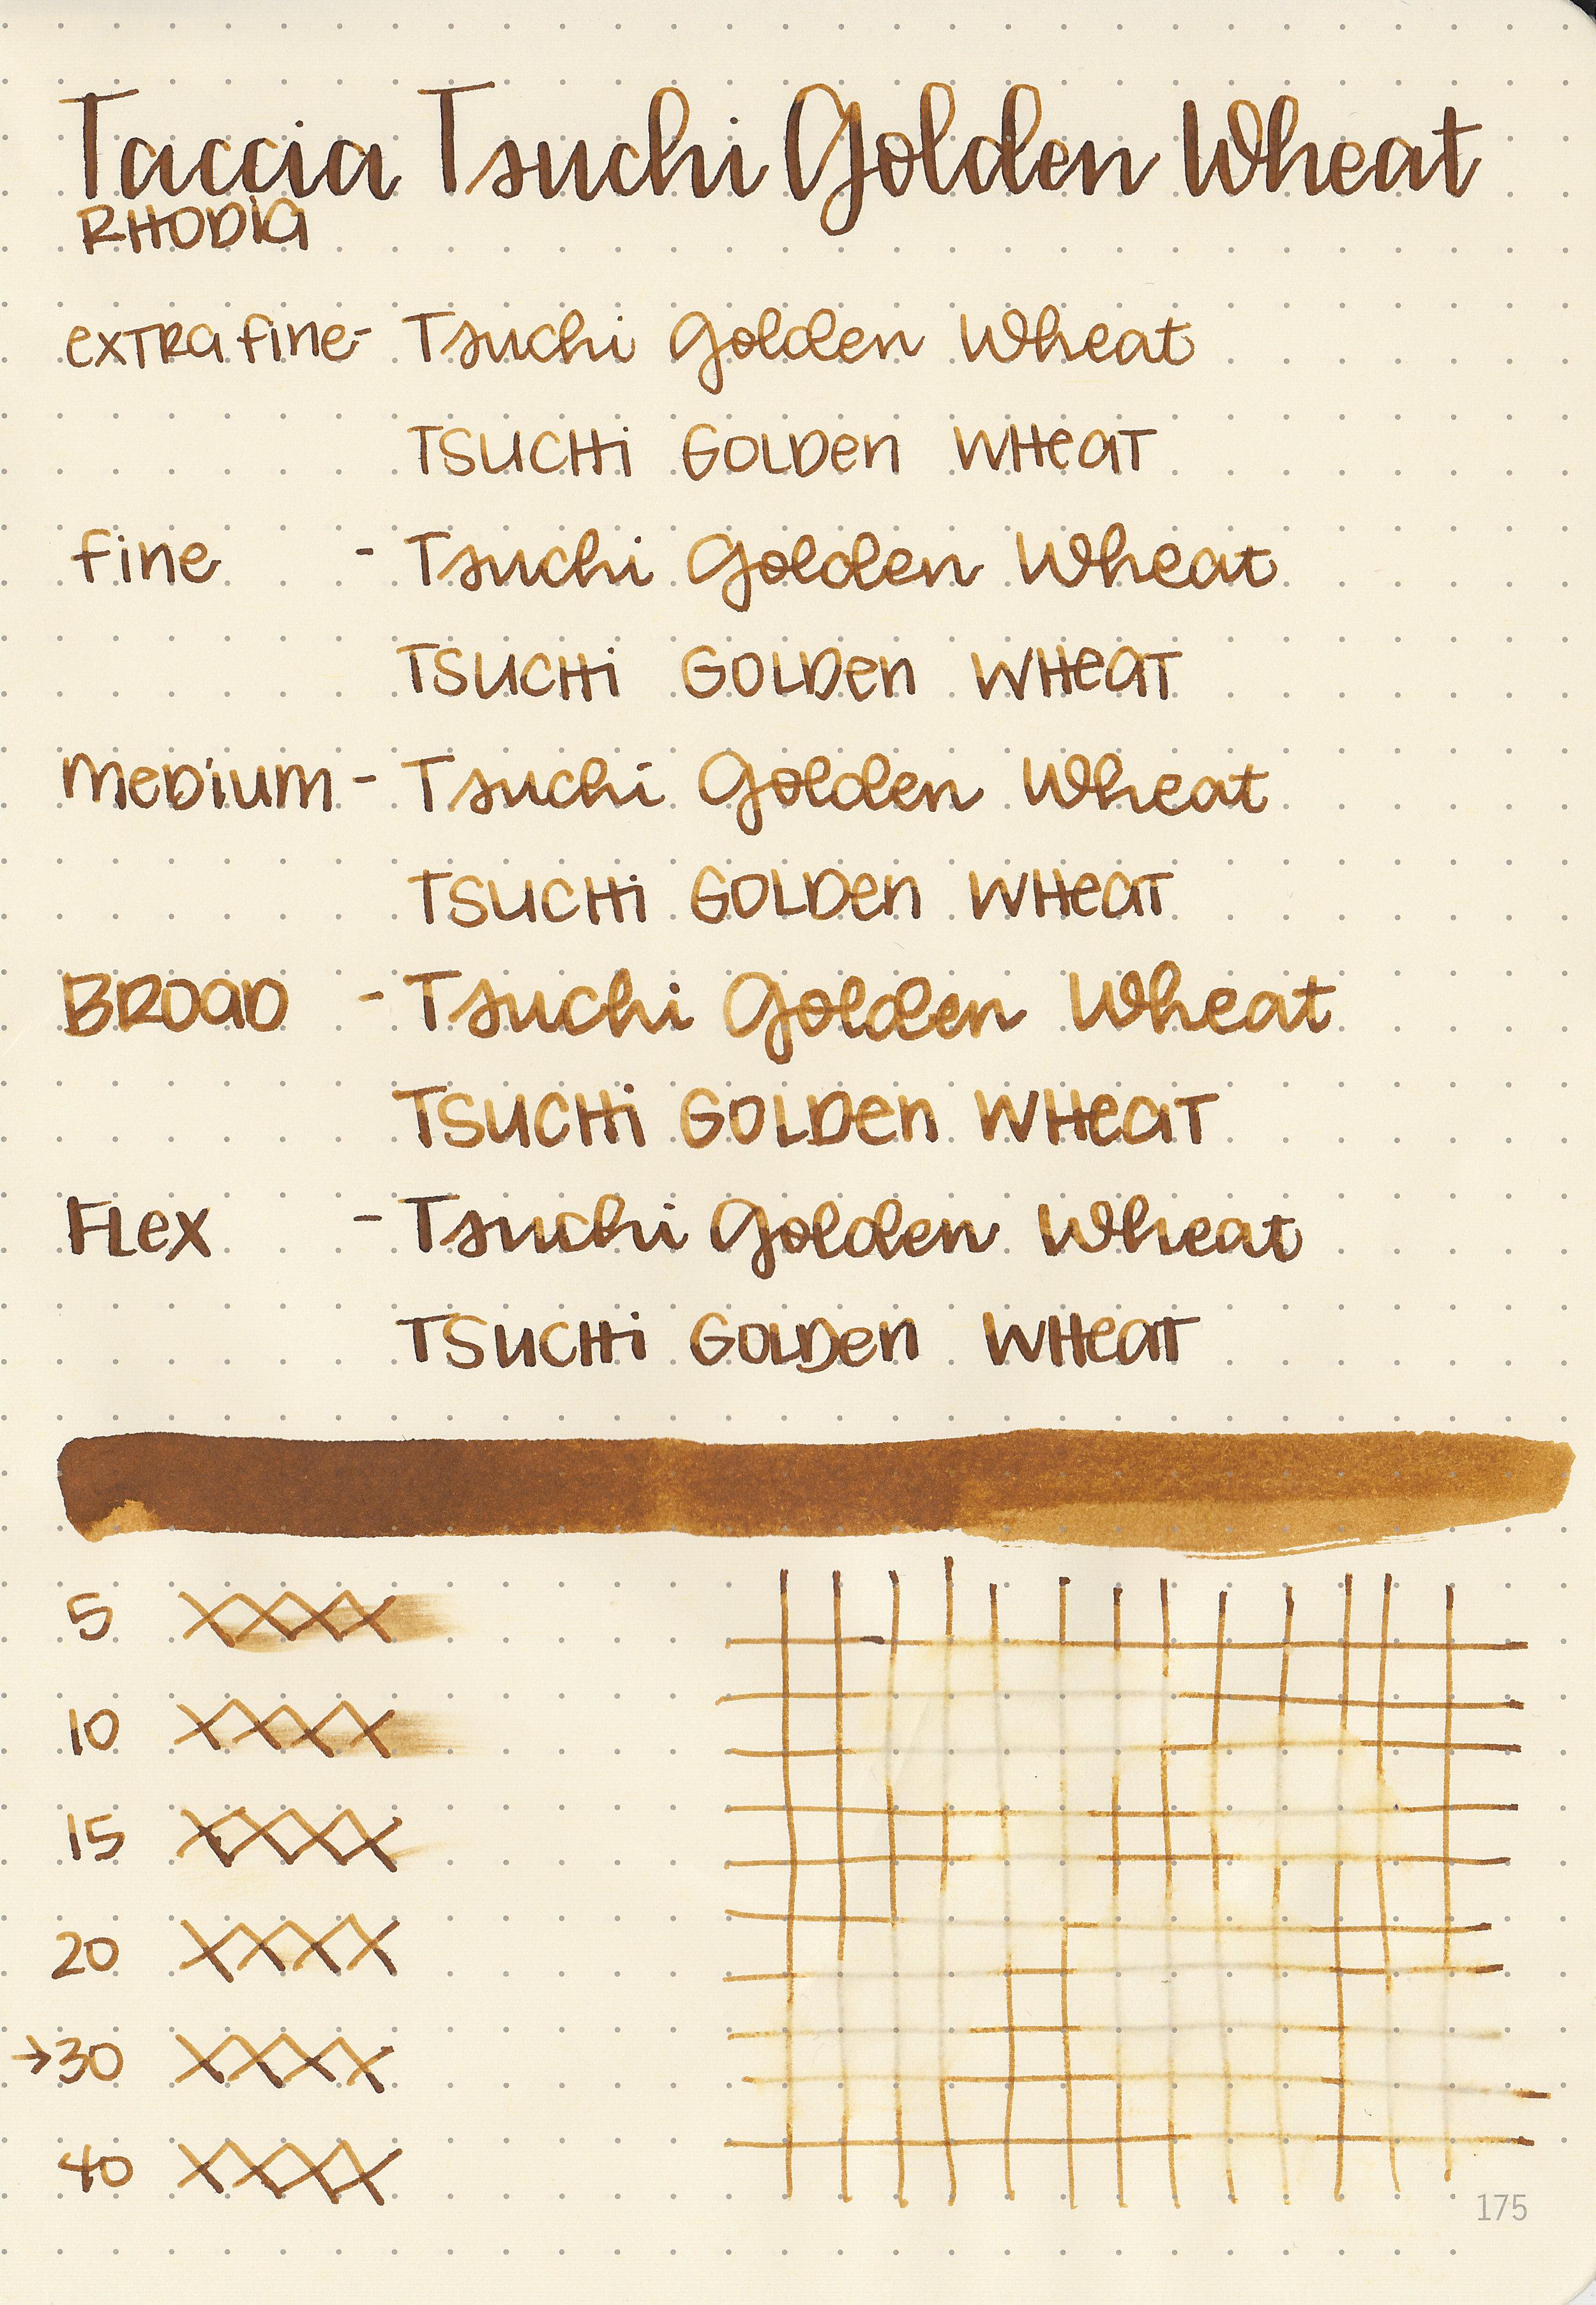 tac-tsuchi-golden-wheat-5.jpg